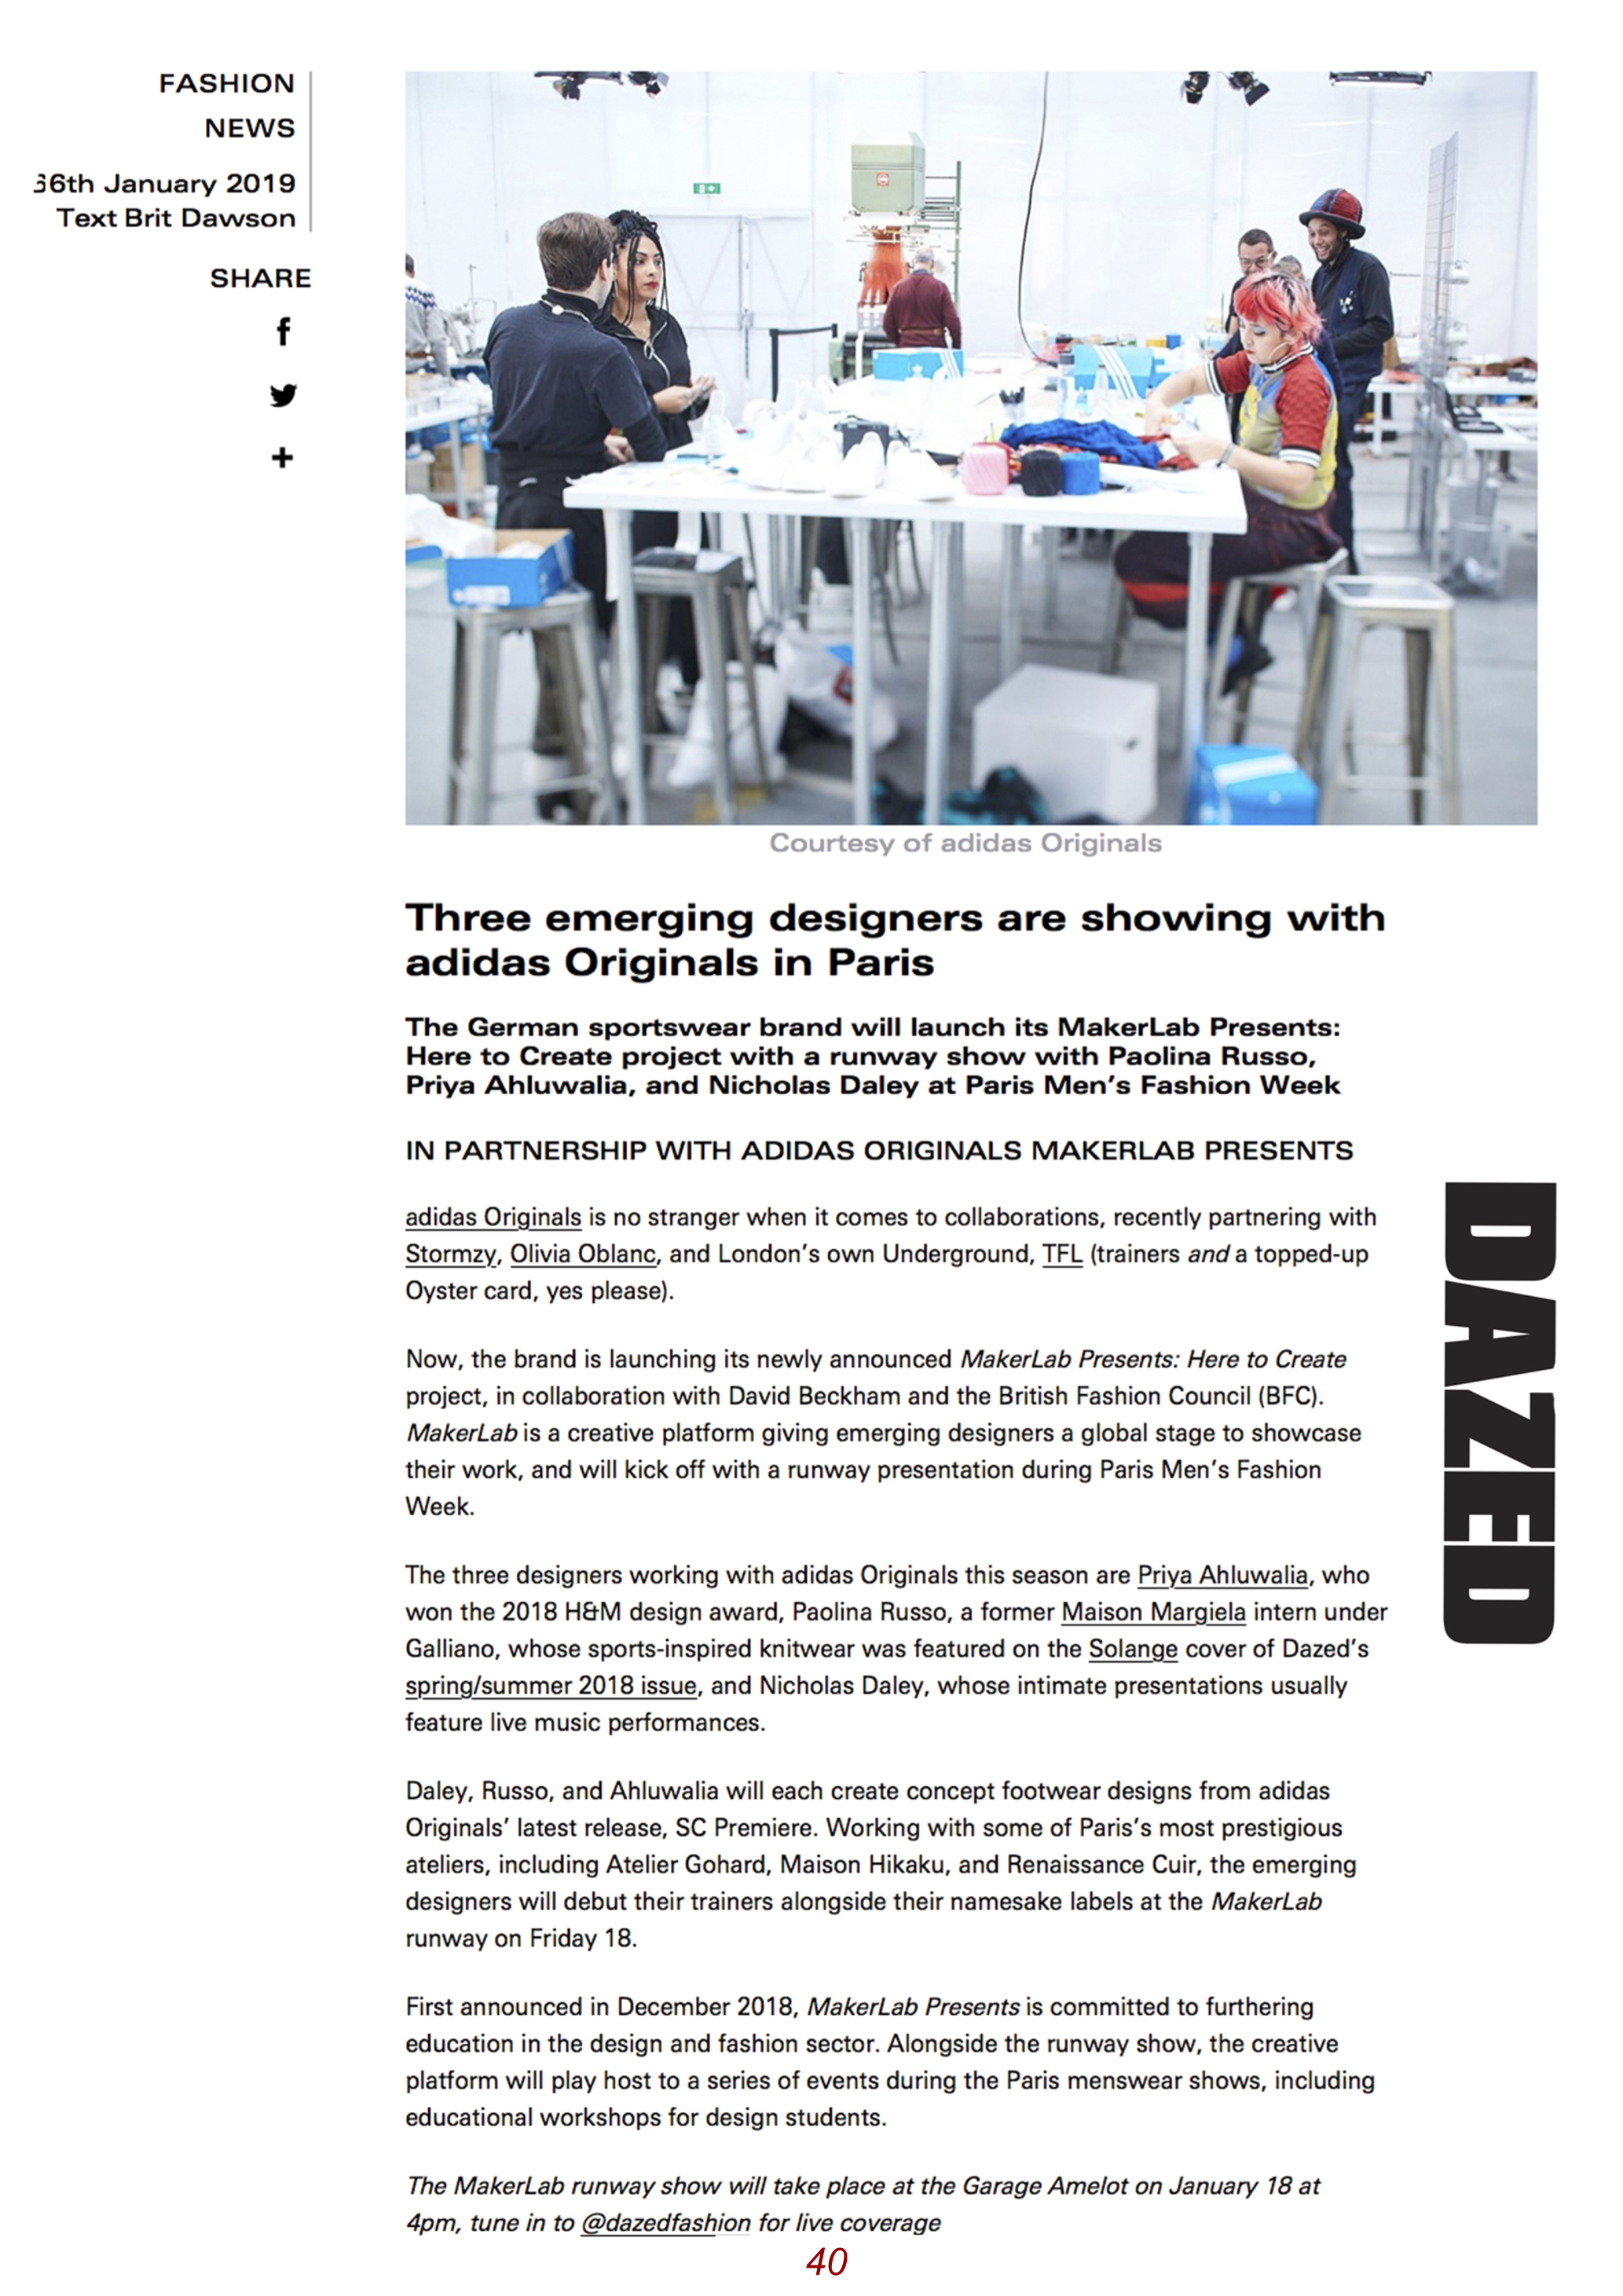 page 40 photo.jpg